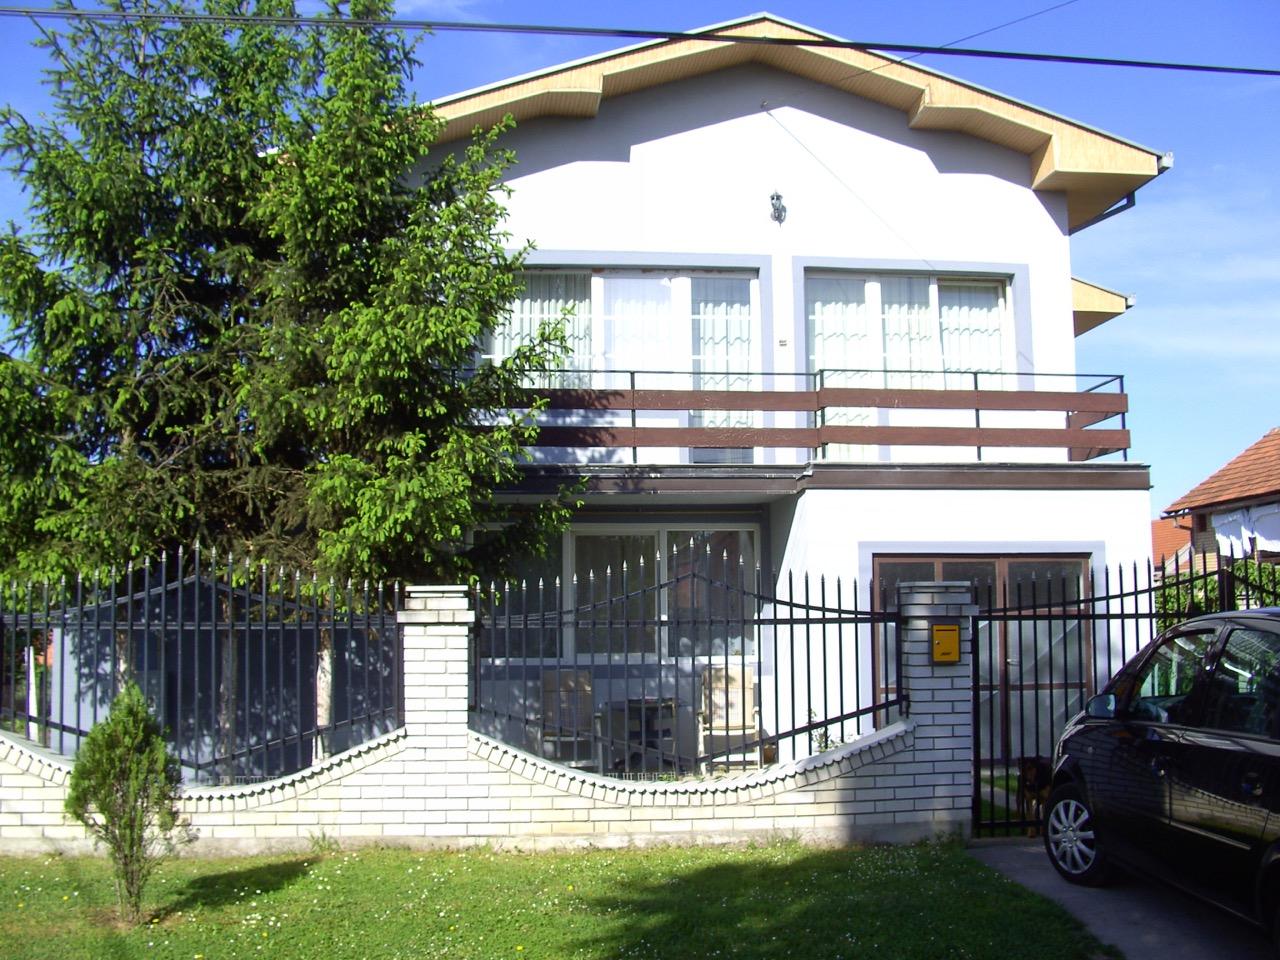 zu verkaufen haus block b sremska mitrovica serbien slobodana maletica 1. Black Bedroom Furniture Sets. Home Design Ideas